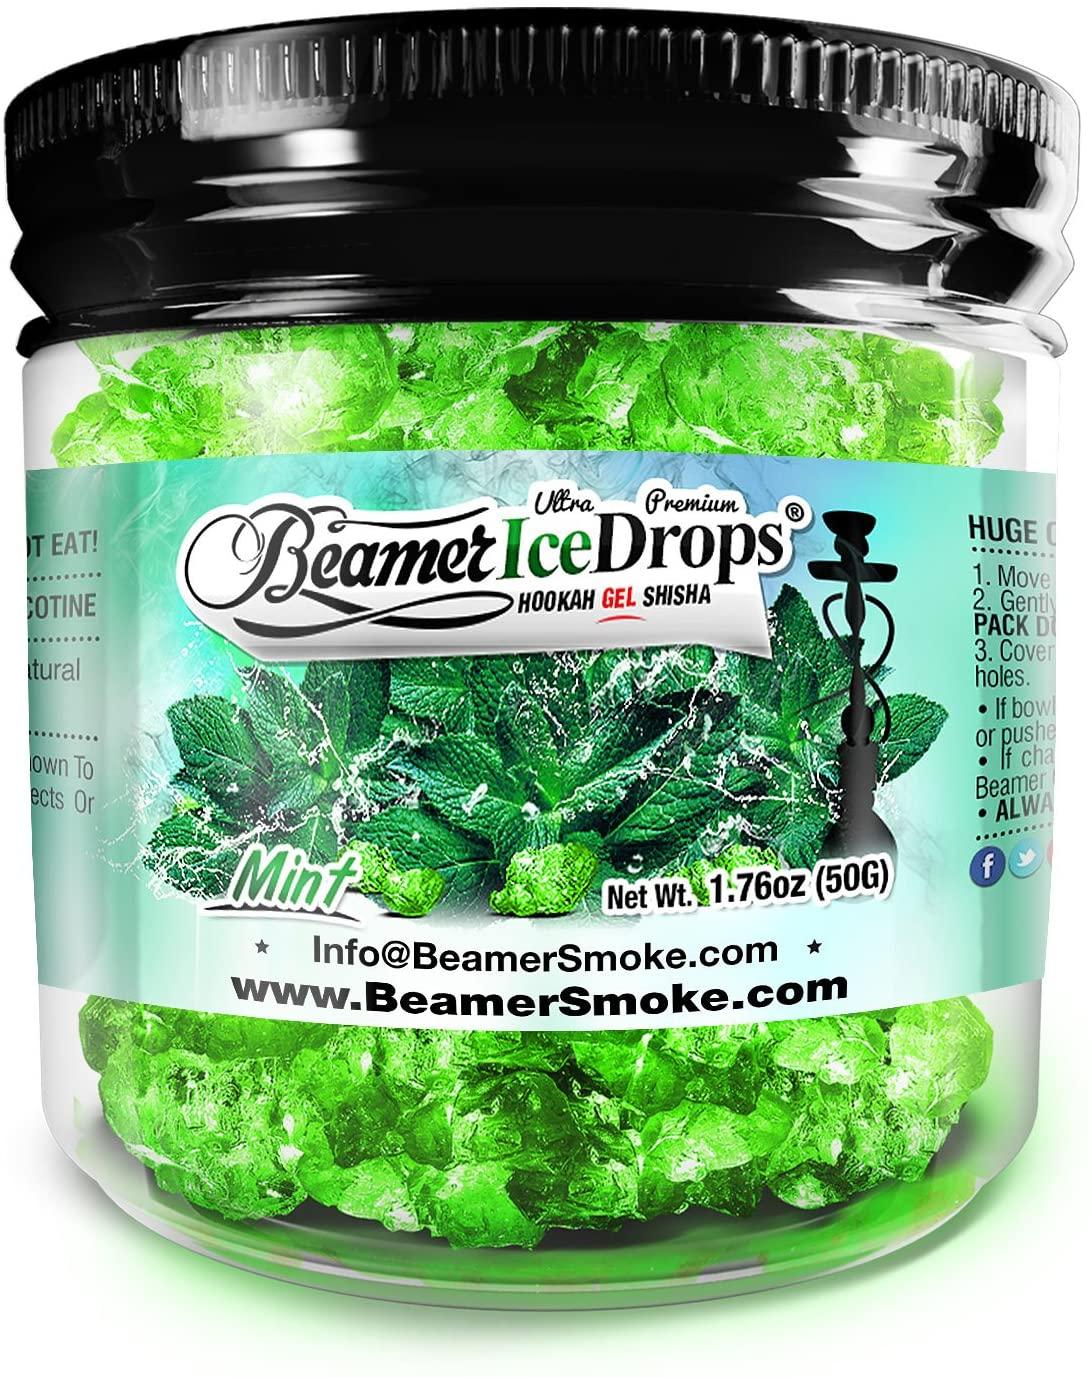 Mint 50G Ultra Premium Beamer Ice Drops Hookah Shisha Smoking Gel. Each Bowl Lasts 2-4 Hours! USA Made, Huge Clouds, Amazing Taste! Better Taste & Clouds Than Tobacco!